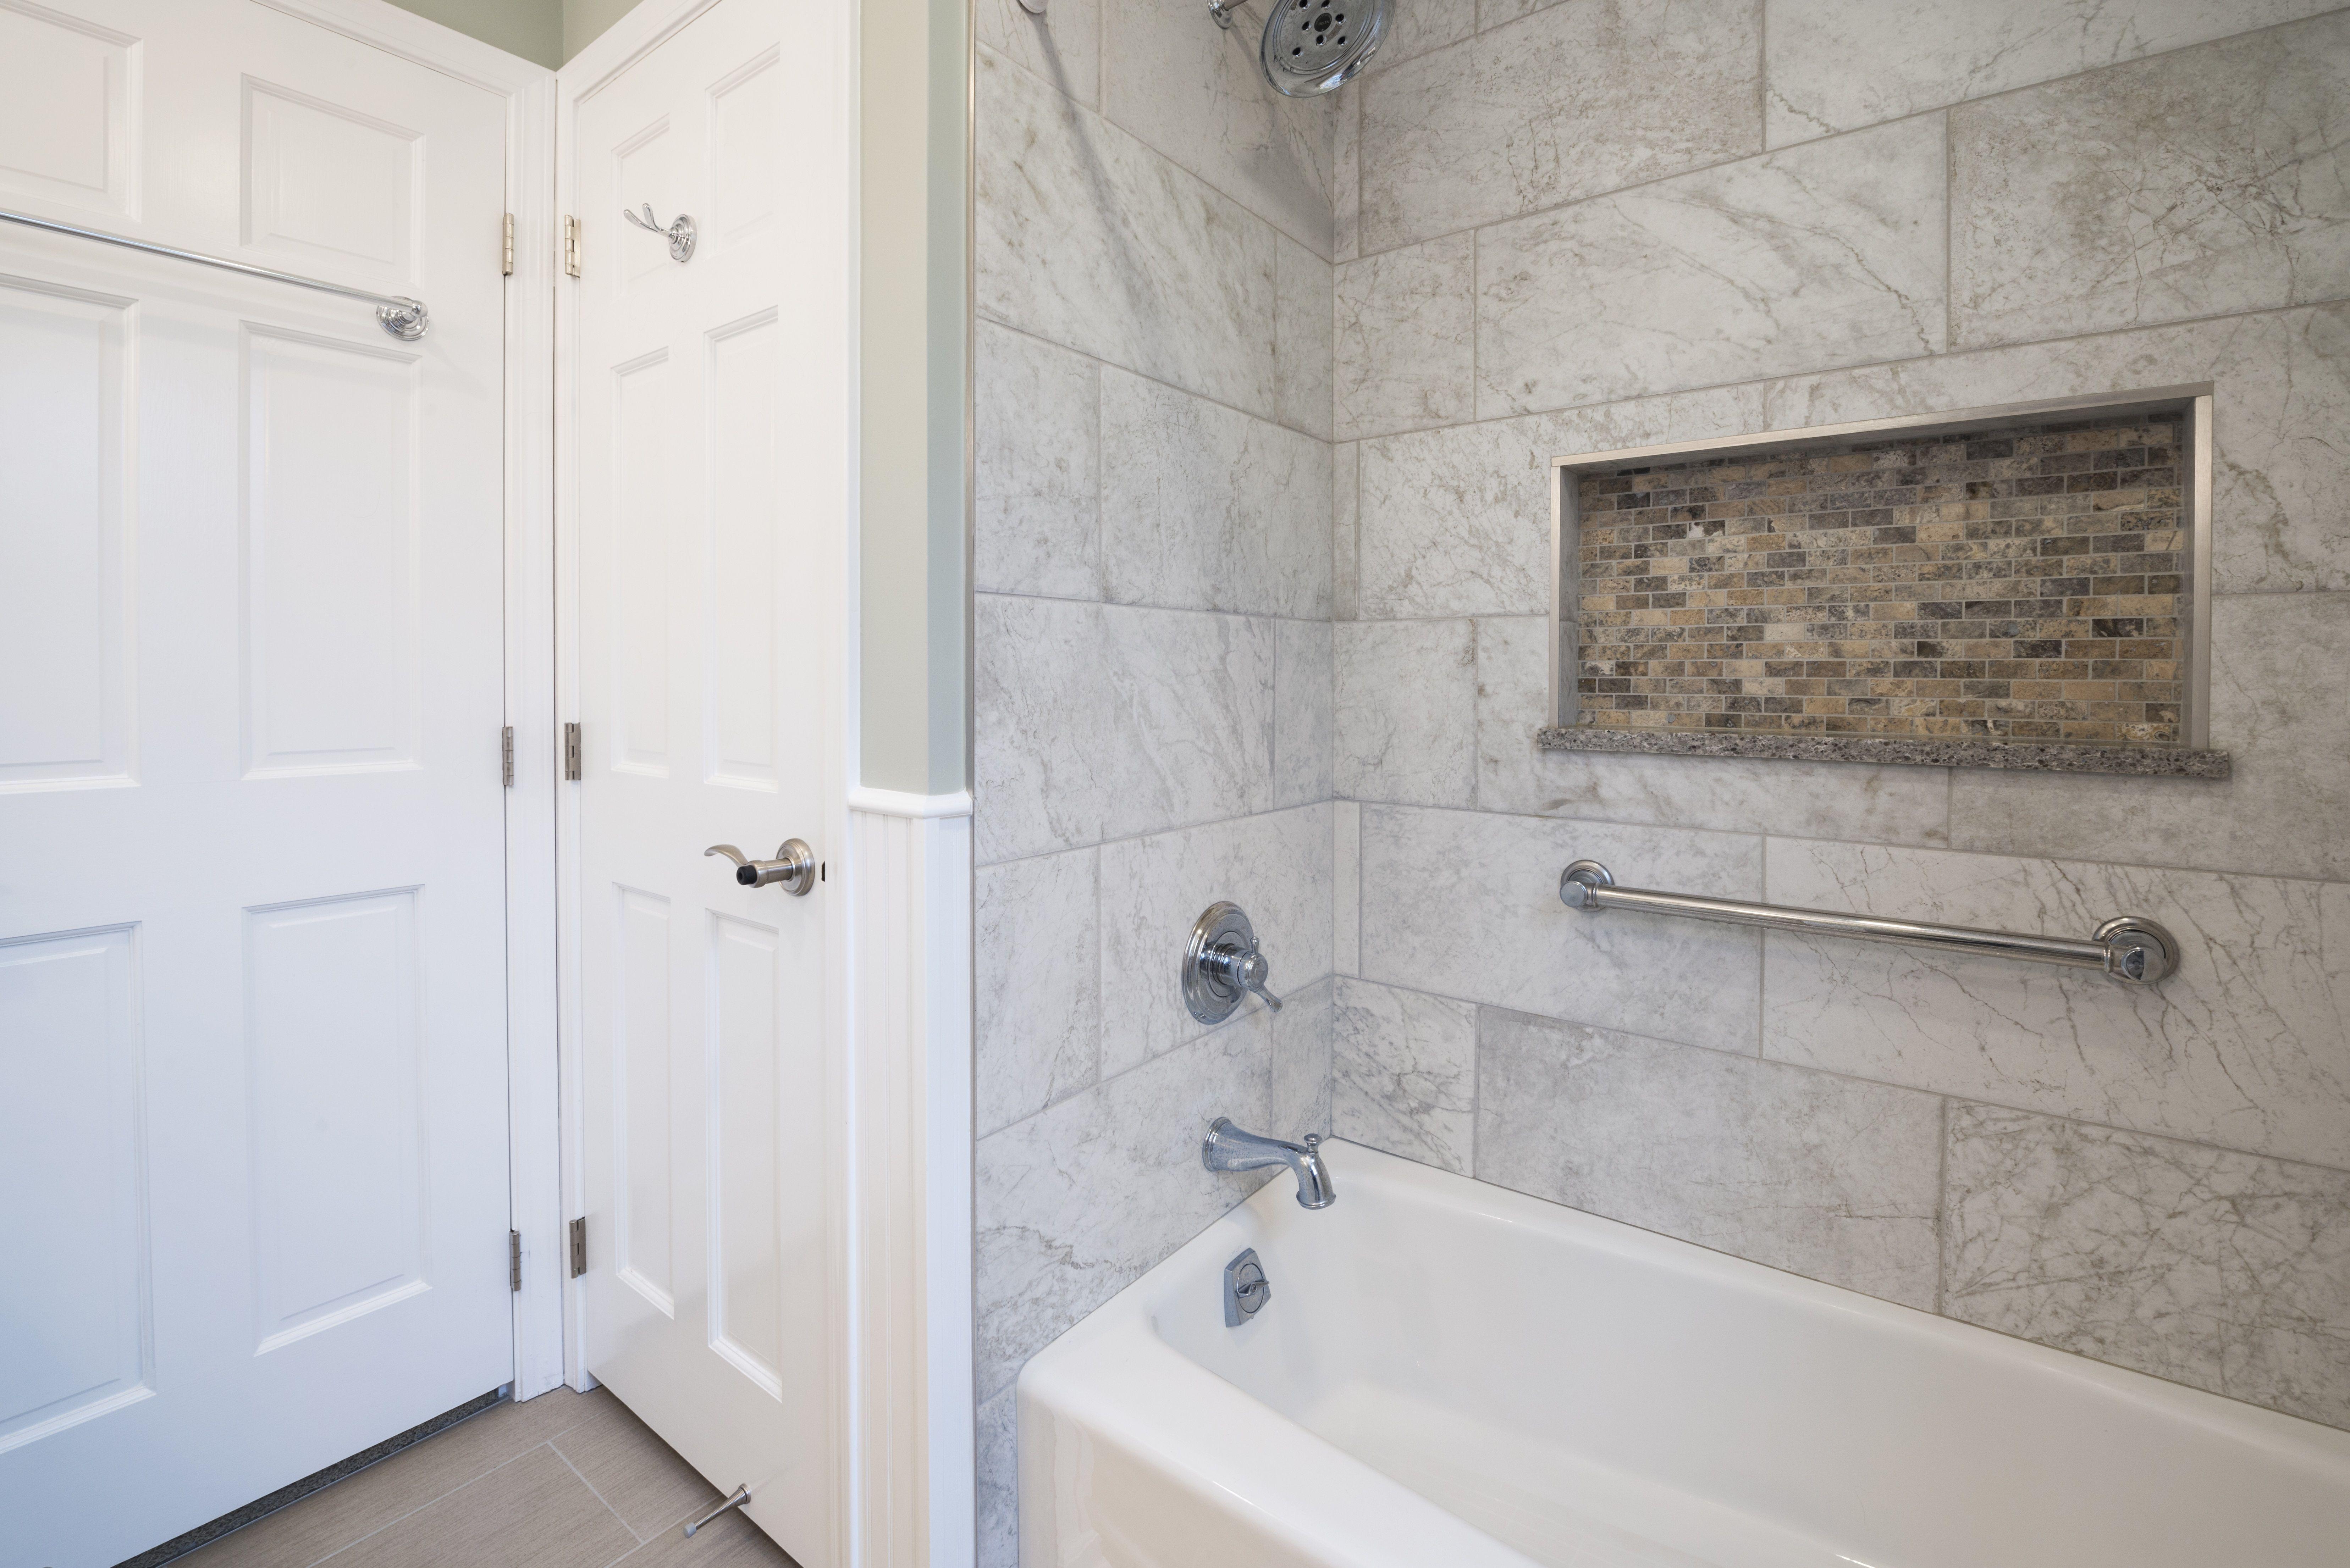 Guest Bathroom Remodel In Indiana Shower Bathtub Wood Look